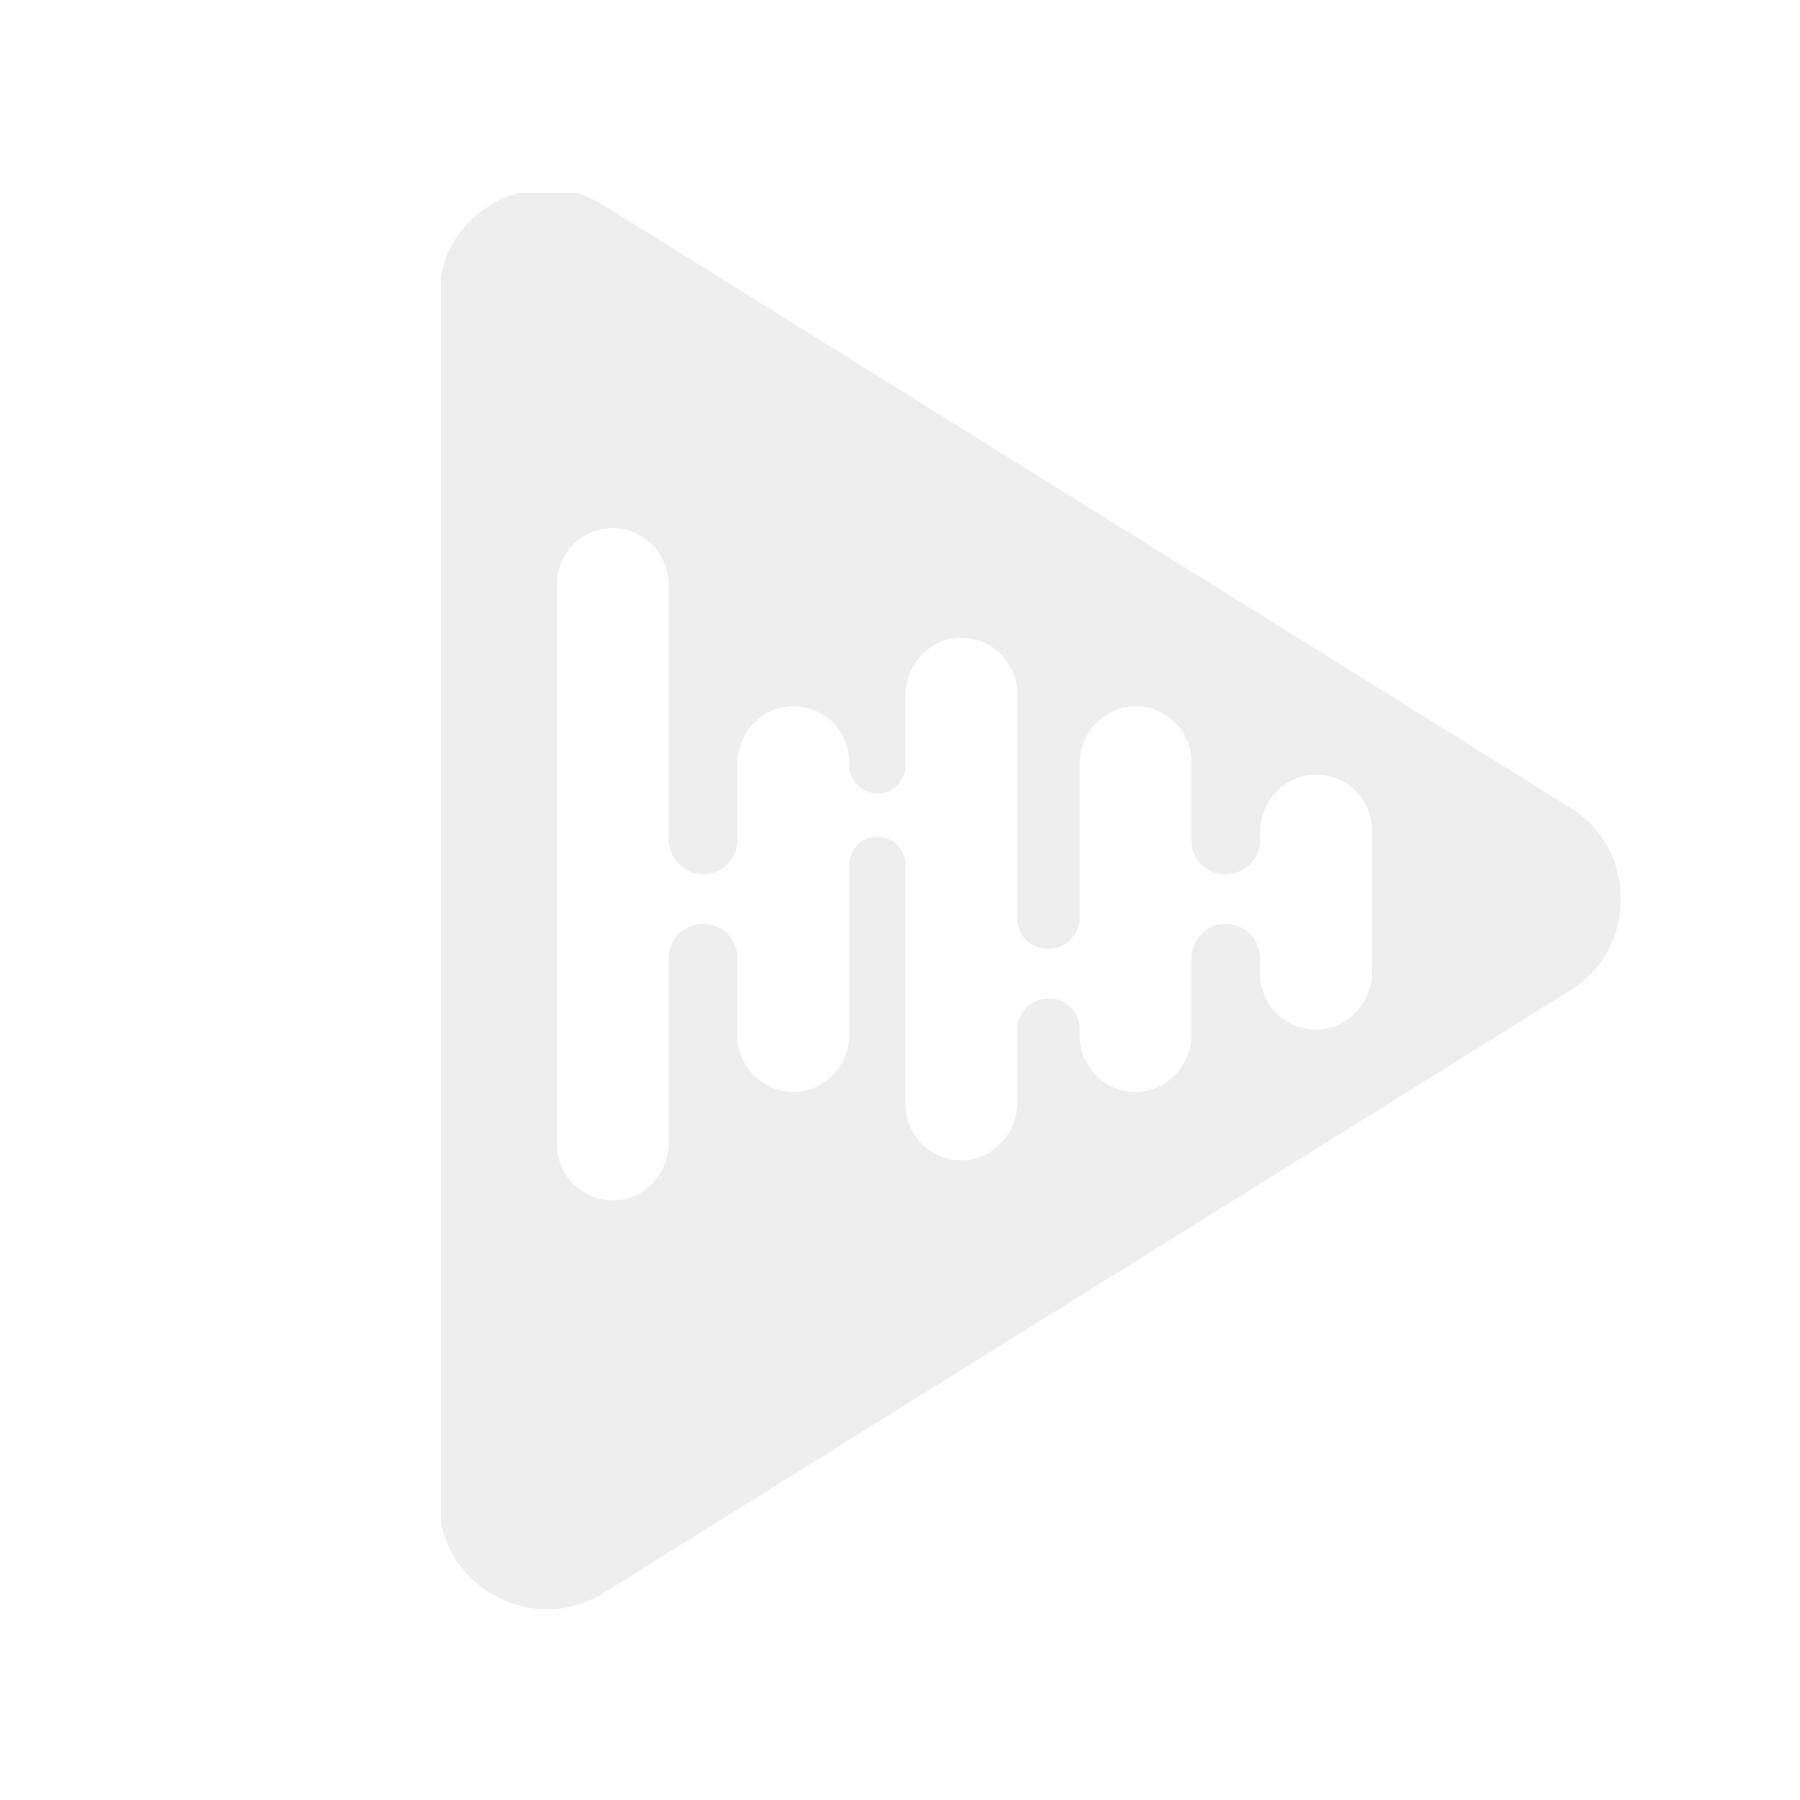 Metra 999105 - Radioadapter, 1-din eller 2-din, Audi A4 ('98-'00) (B5) /m symphony radio